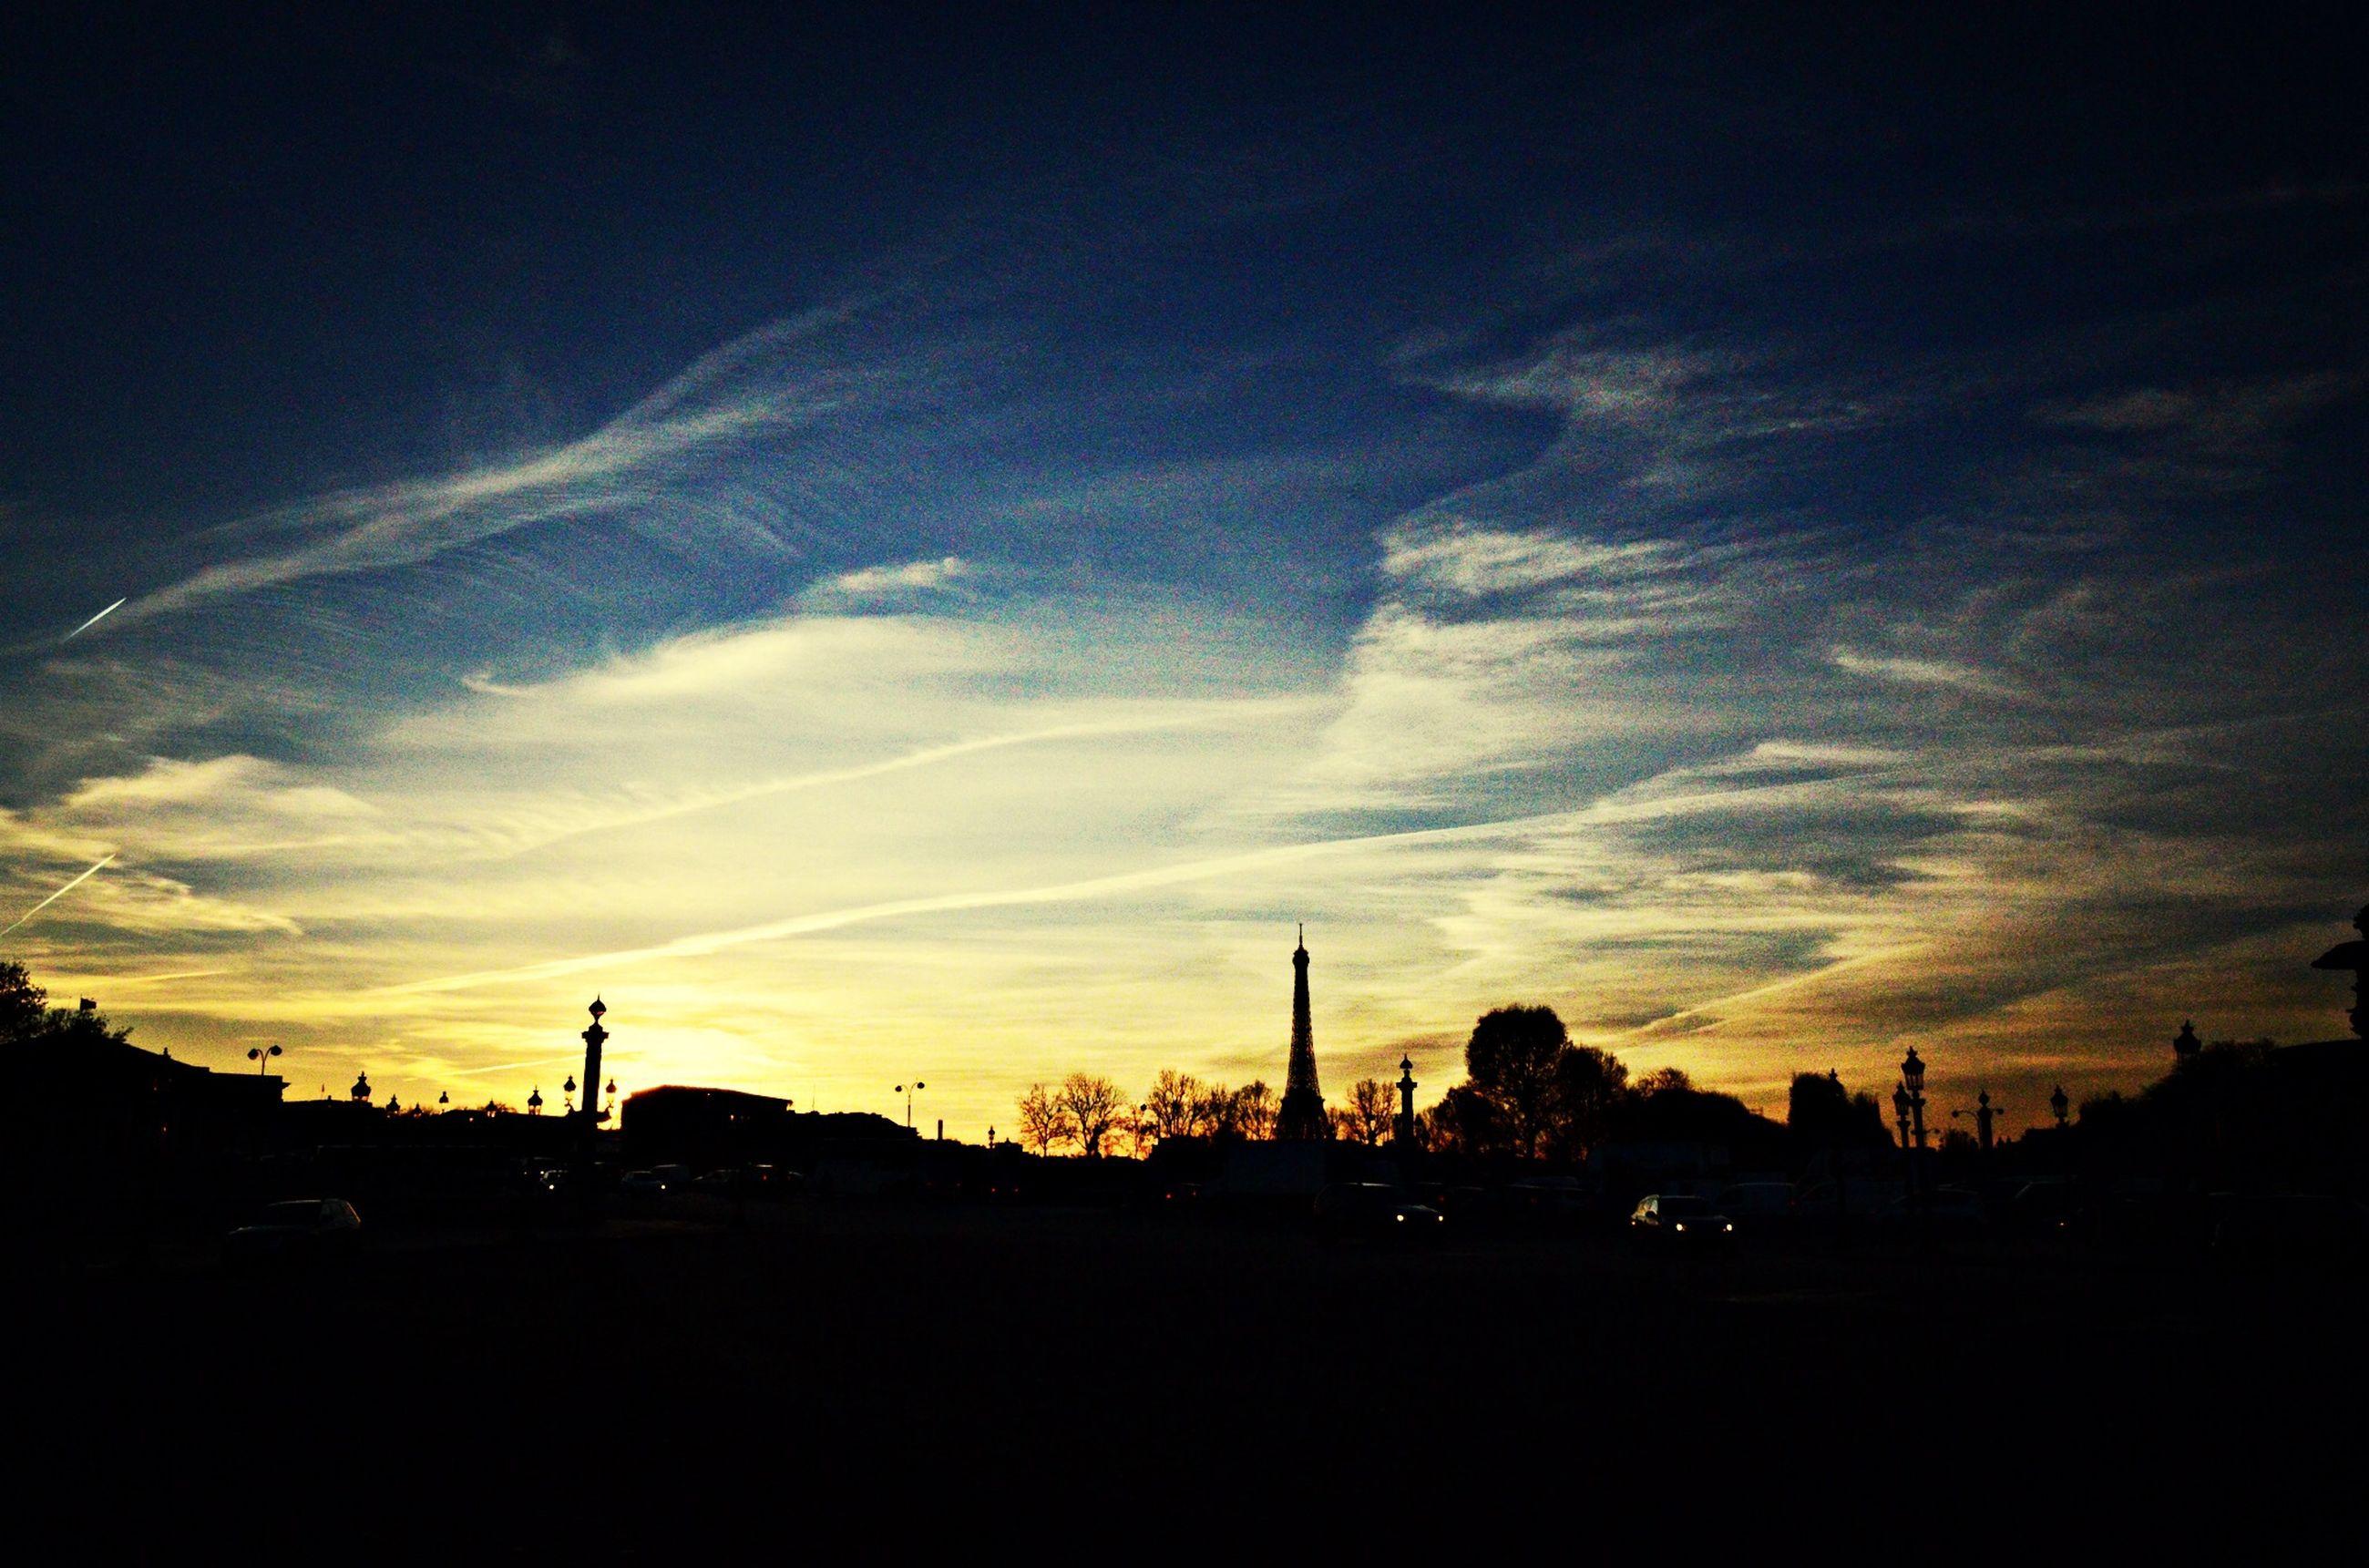 silhouette, sunset, sky, building exterior, cloud - sky, built structure, architecture, dark, cloud, road, city, street, car, street light, tree, dusk, outdoors, beauty in nature, transportation, nature